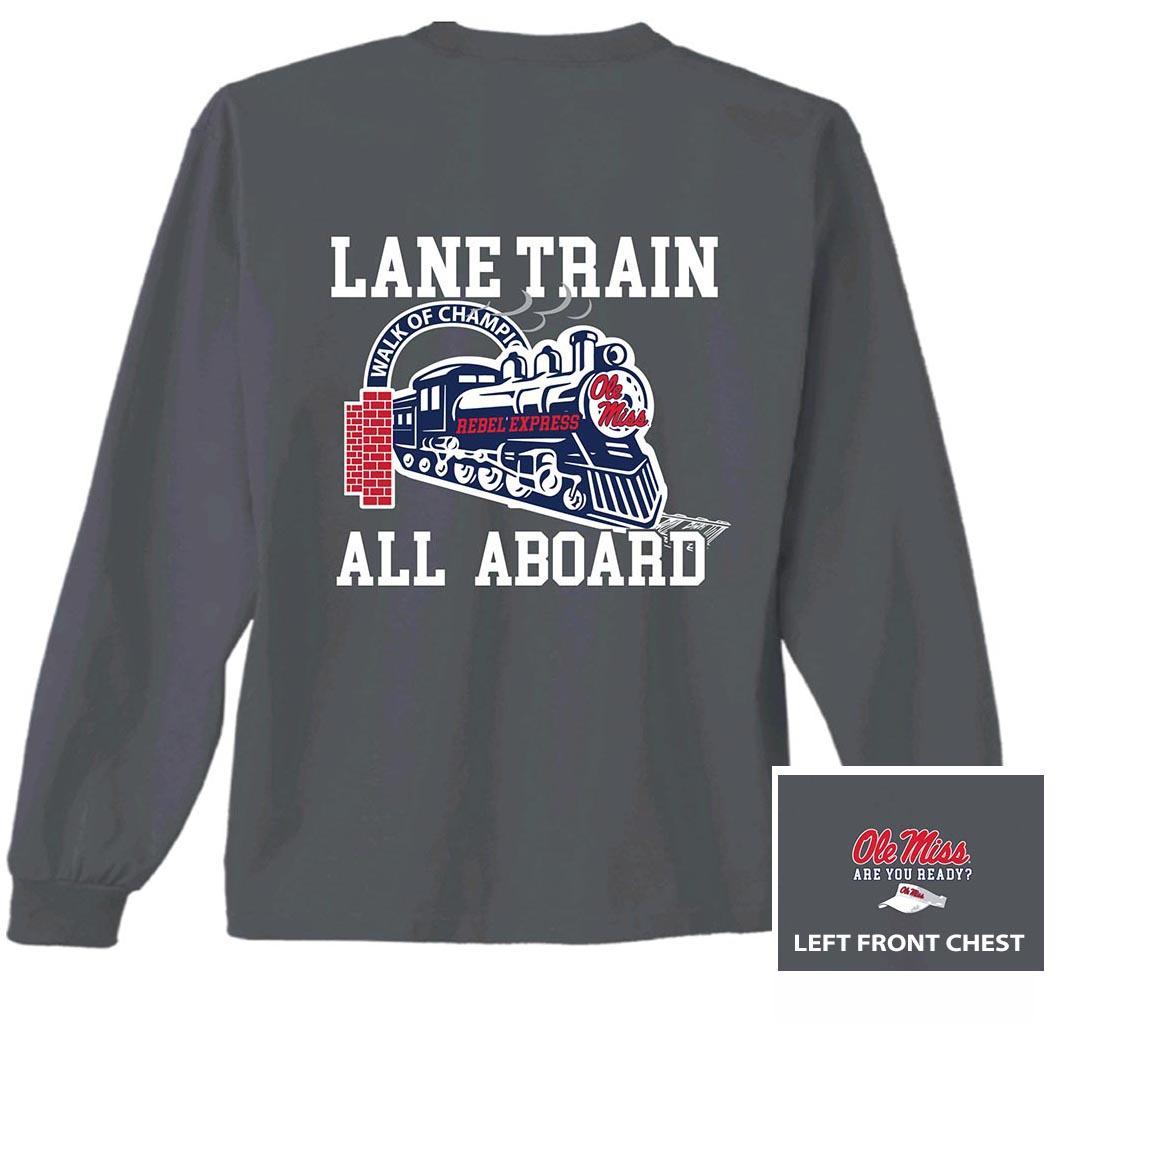 Youth Ls Lane Train Tee